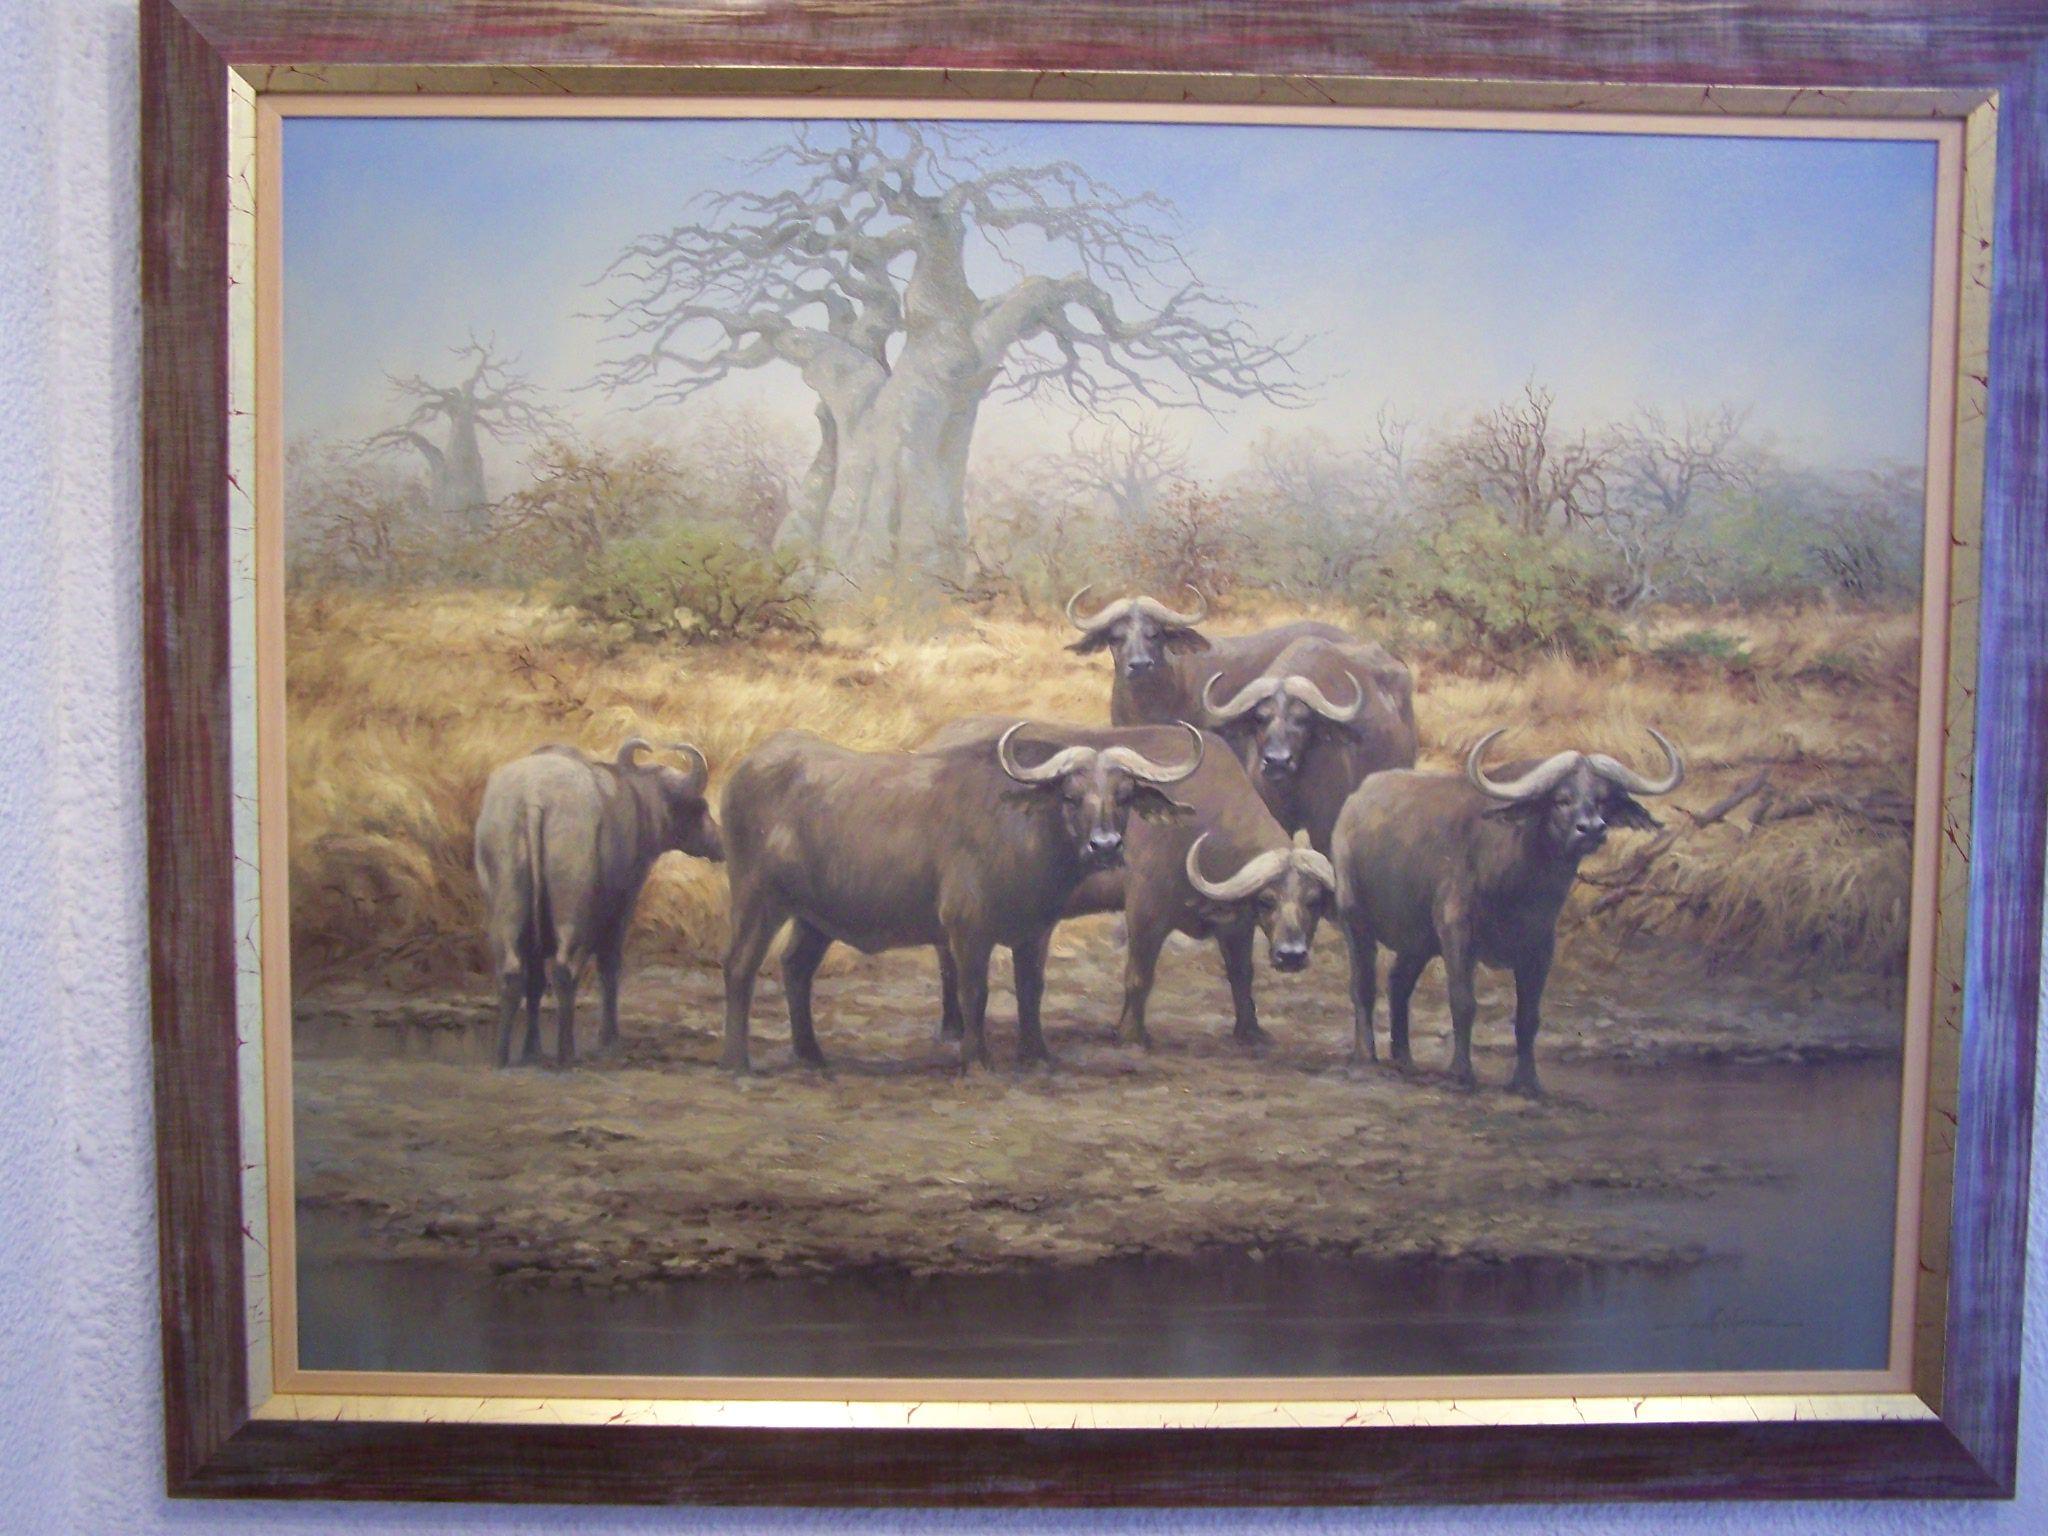 savannah buffaloes